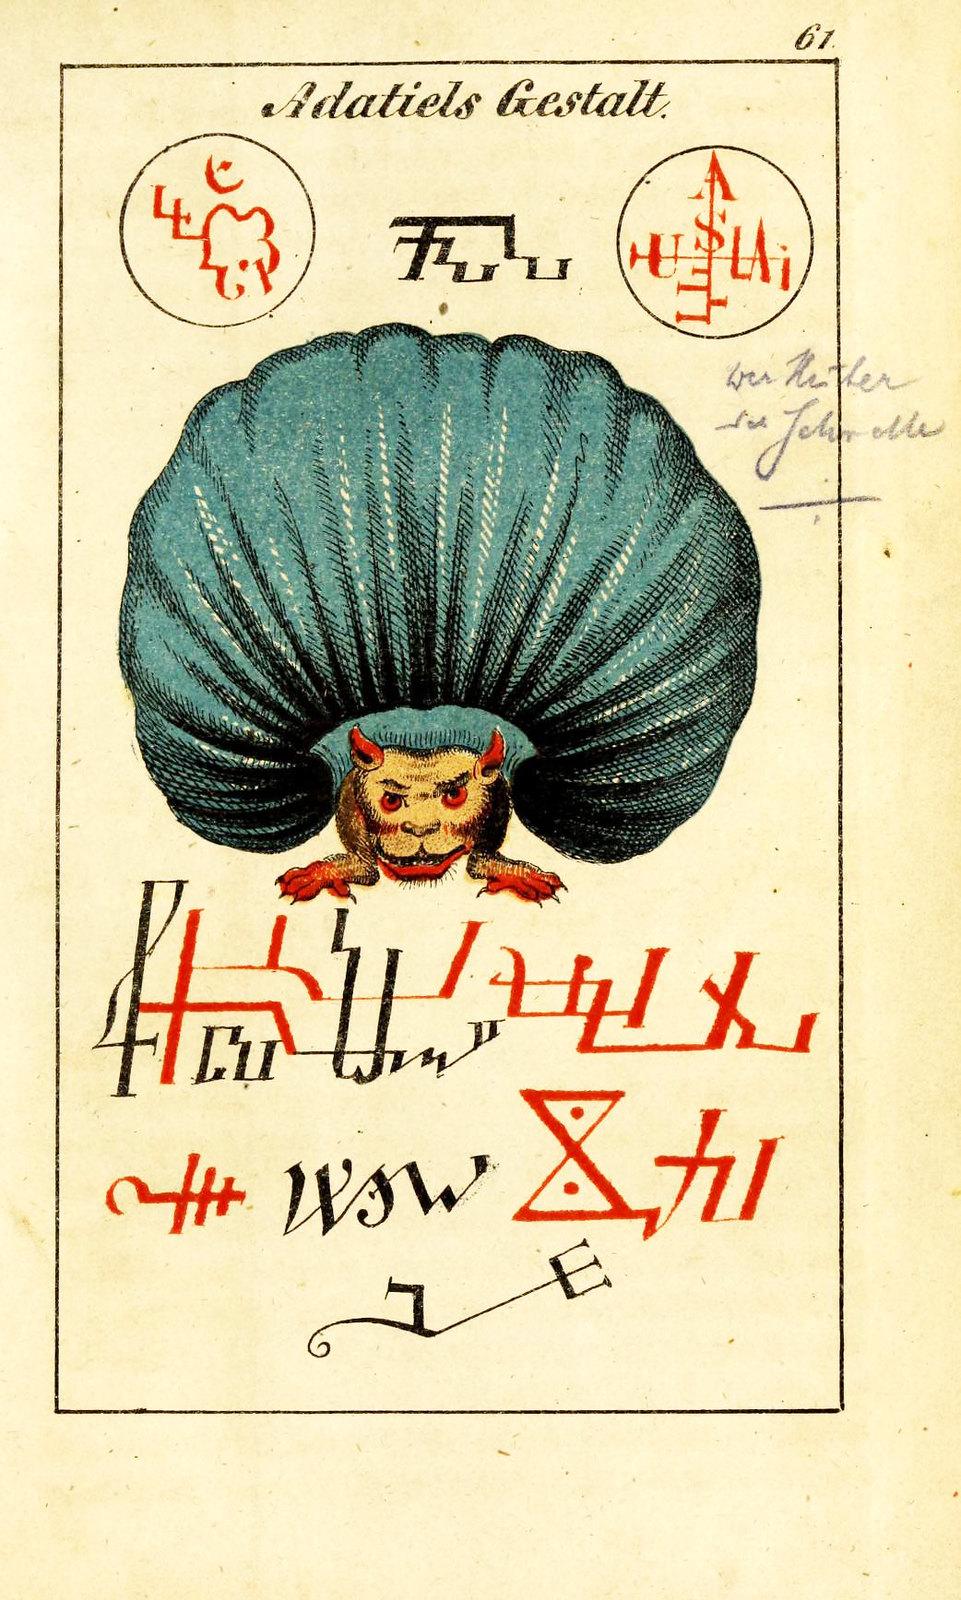 Johann Scheible - Doktor Johannes Faust's Magia naturalis et innaturalis, 1849 (10)